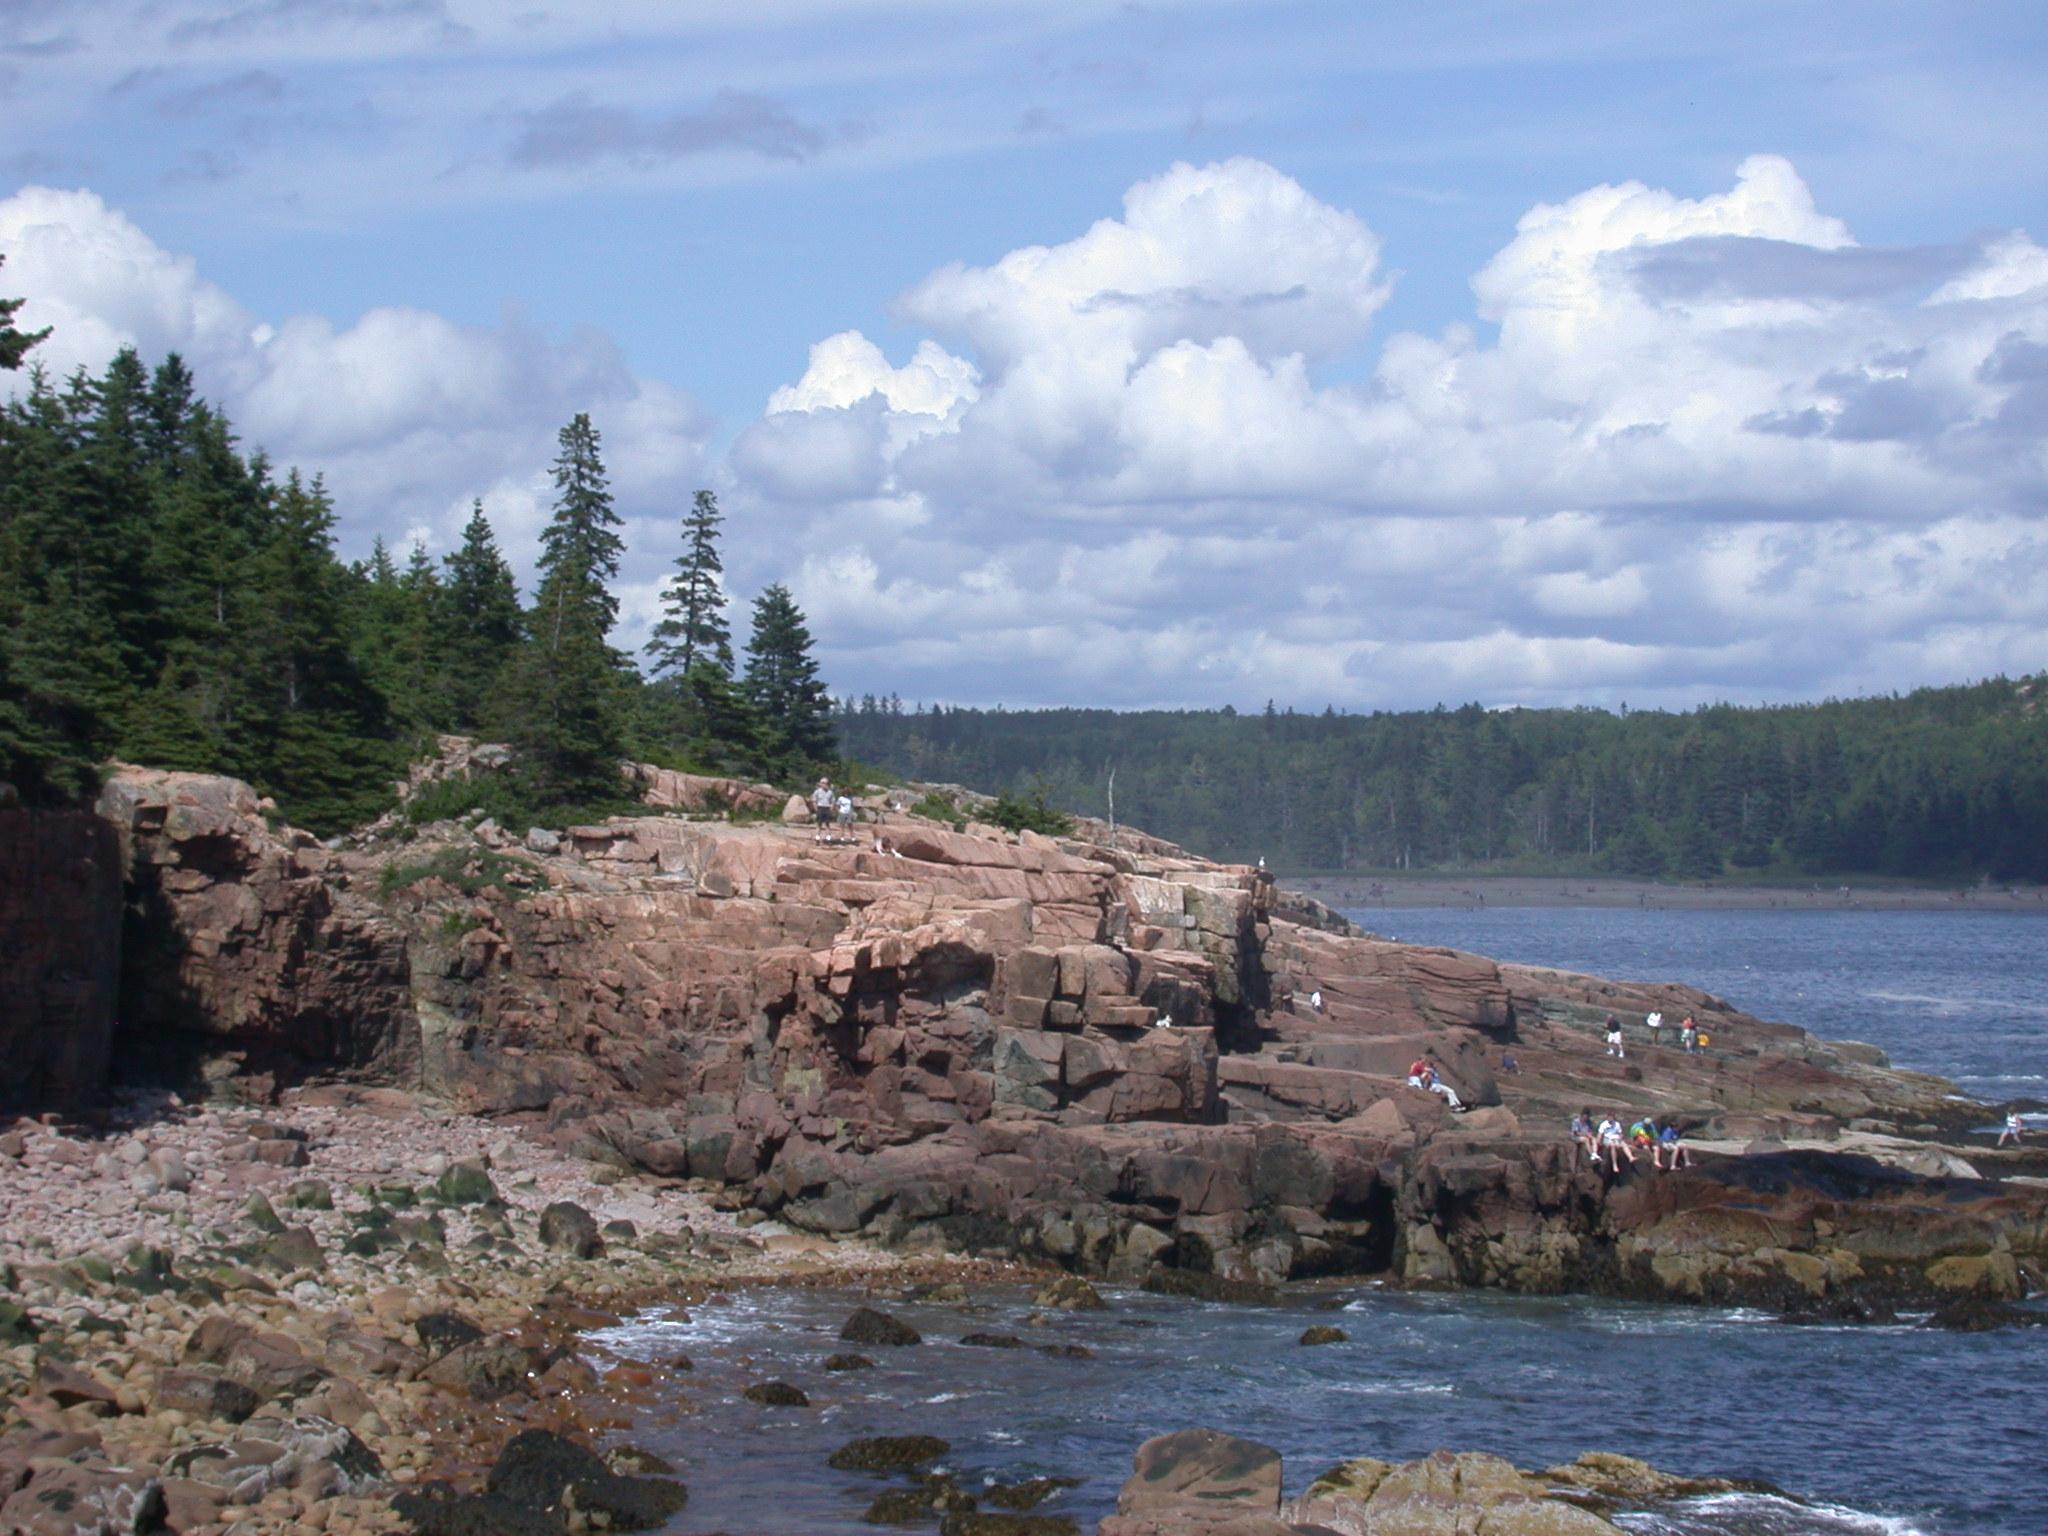 File:Maine coast.JPG - Wikimedia Commons